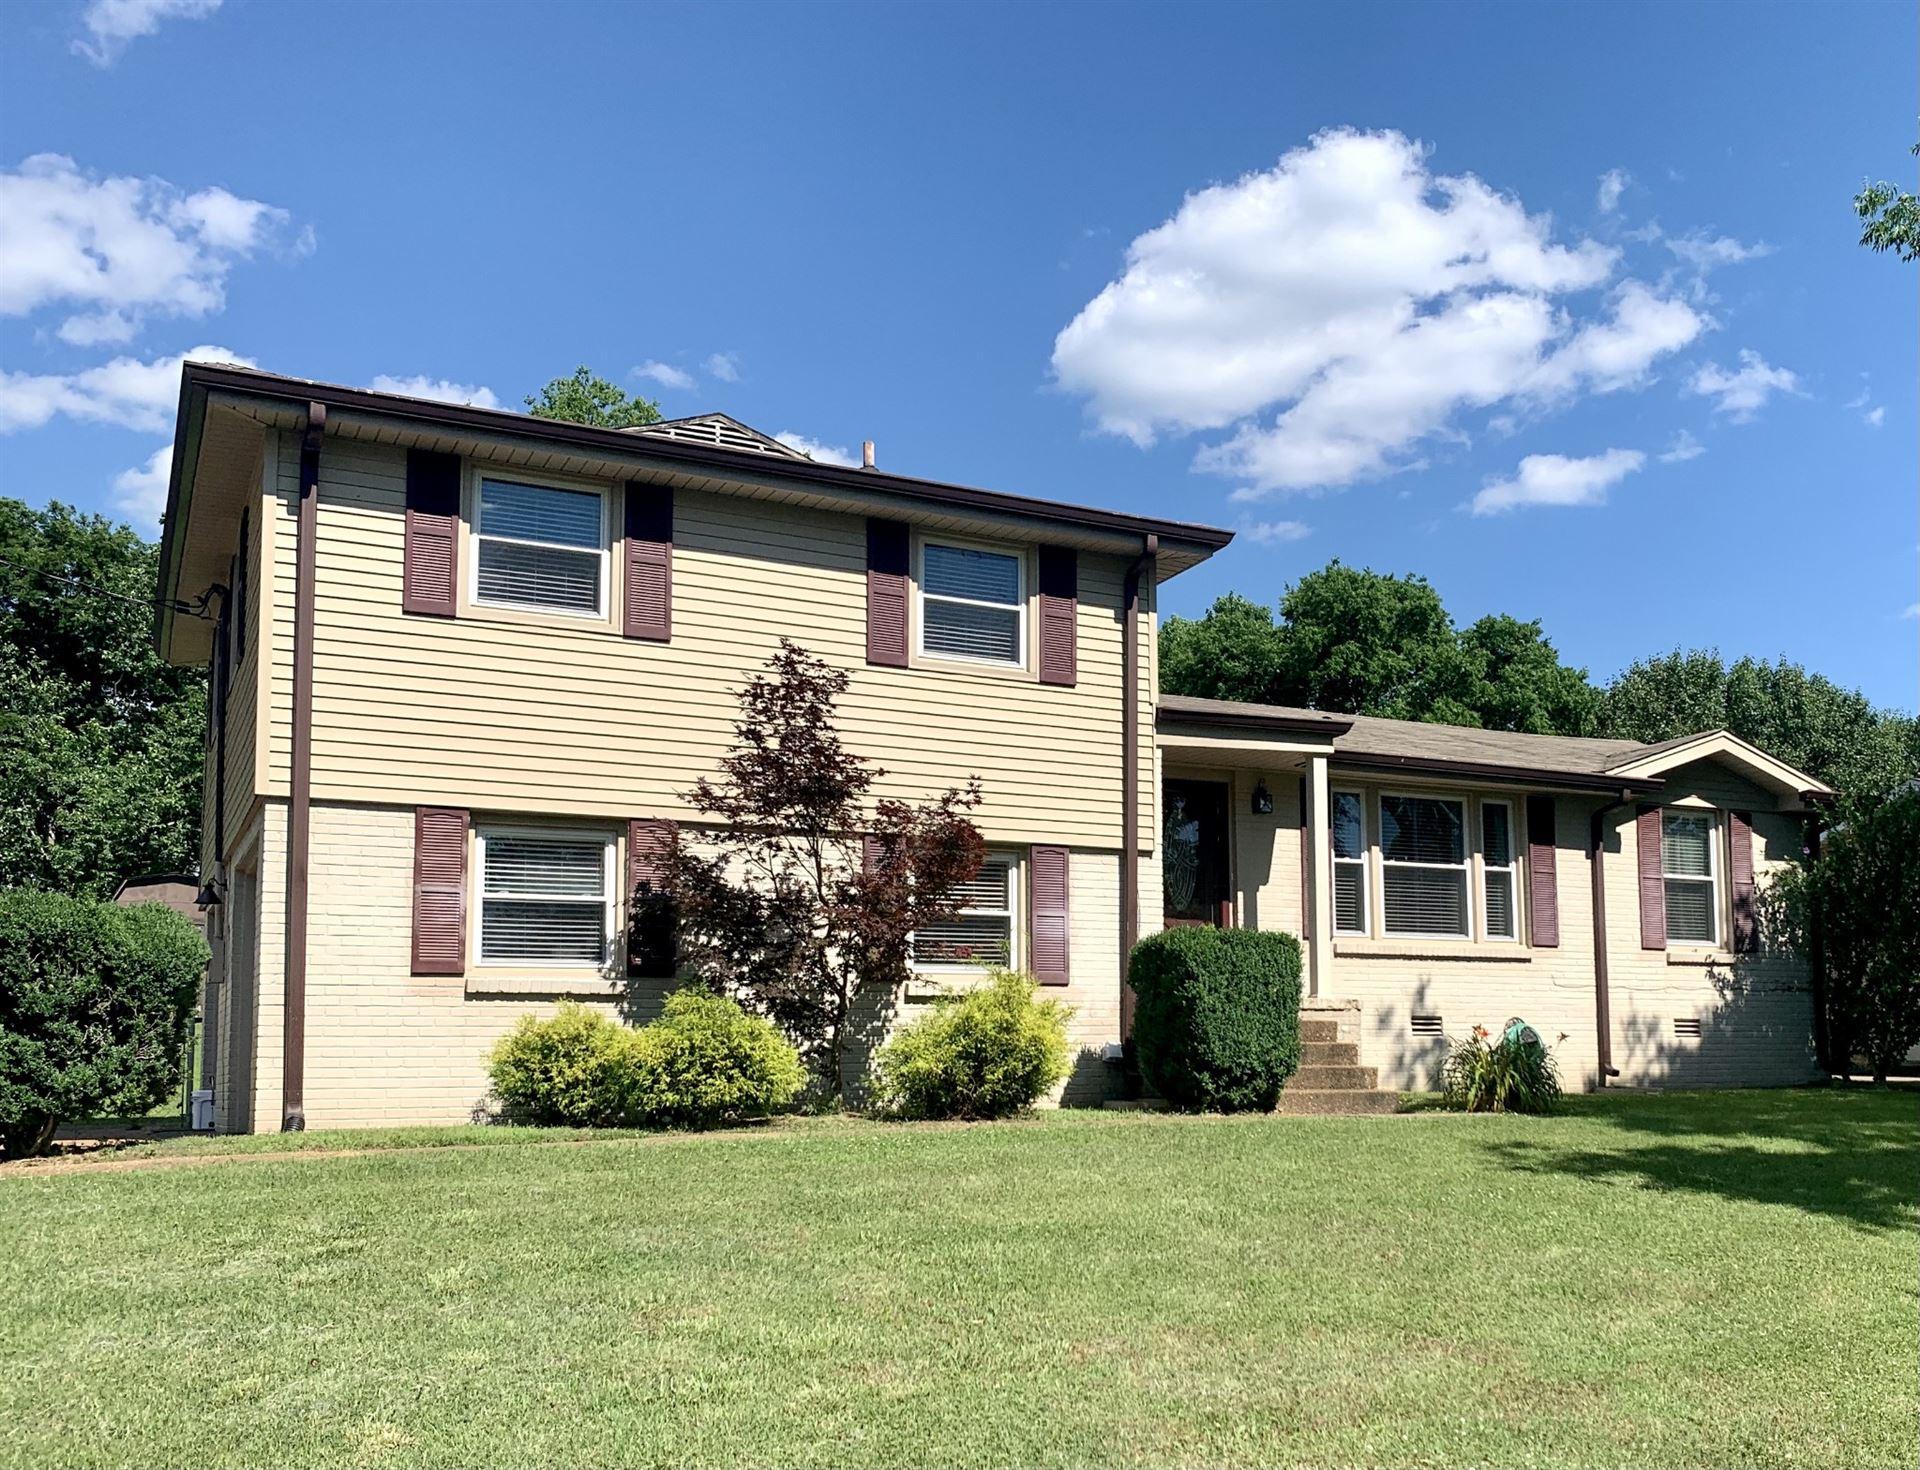 313 Donna Dr, Hendersonville, TN 37075 - MLS#: 2263085